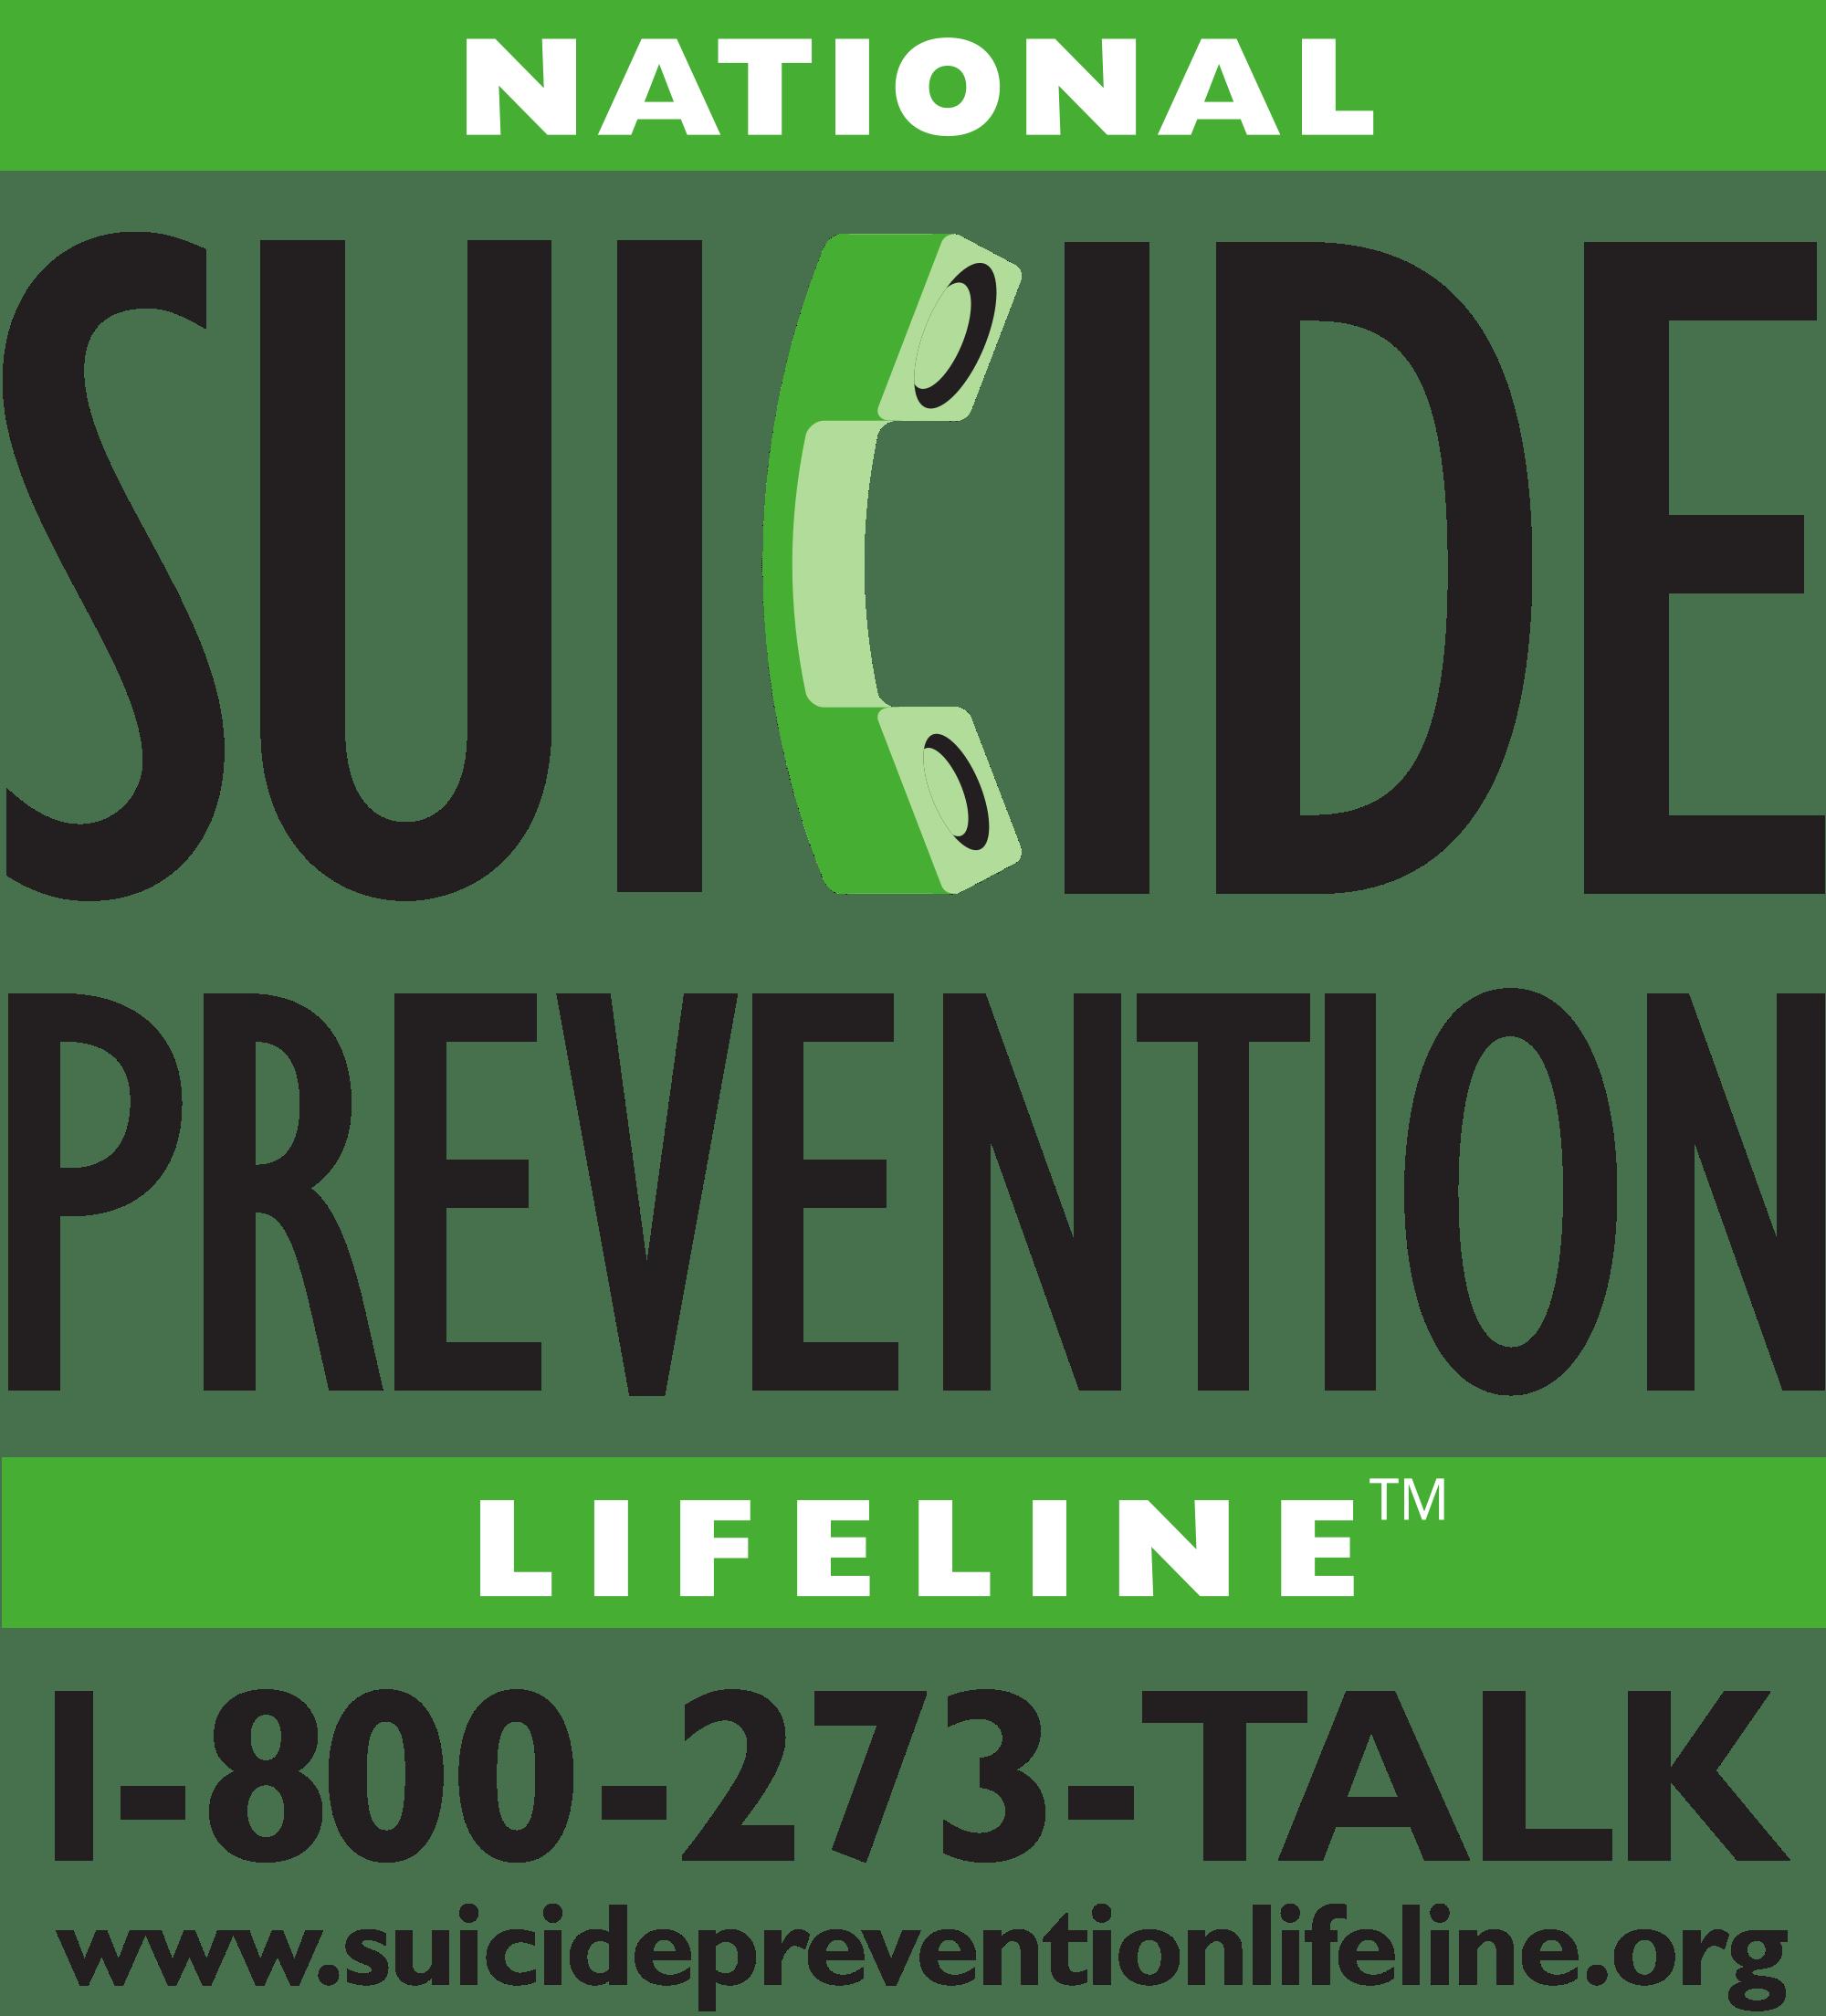 1-800-273-8255